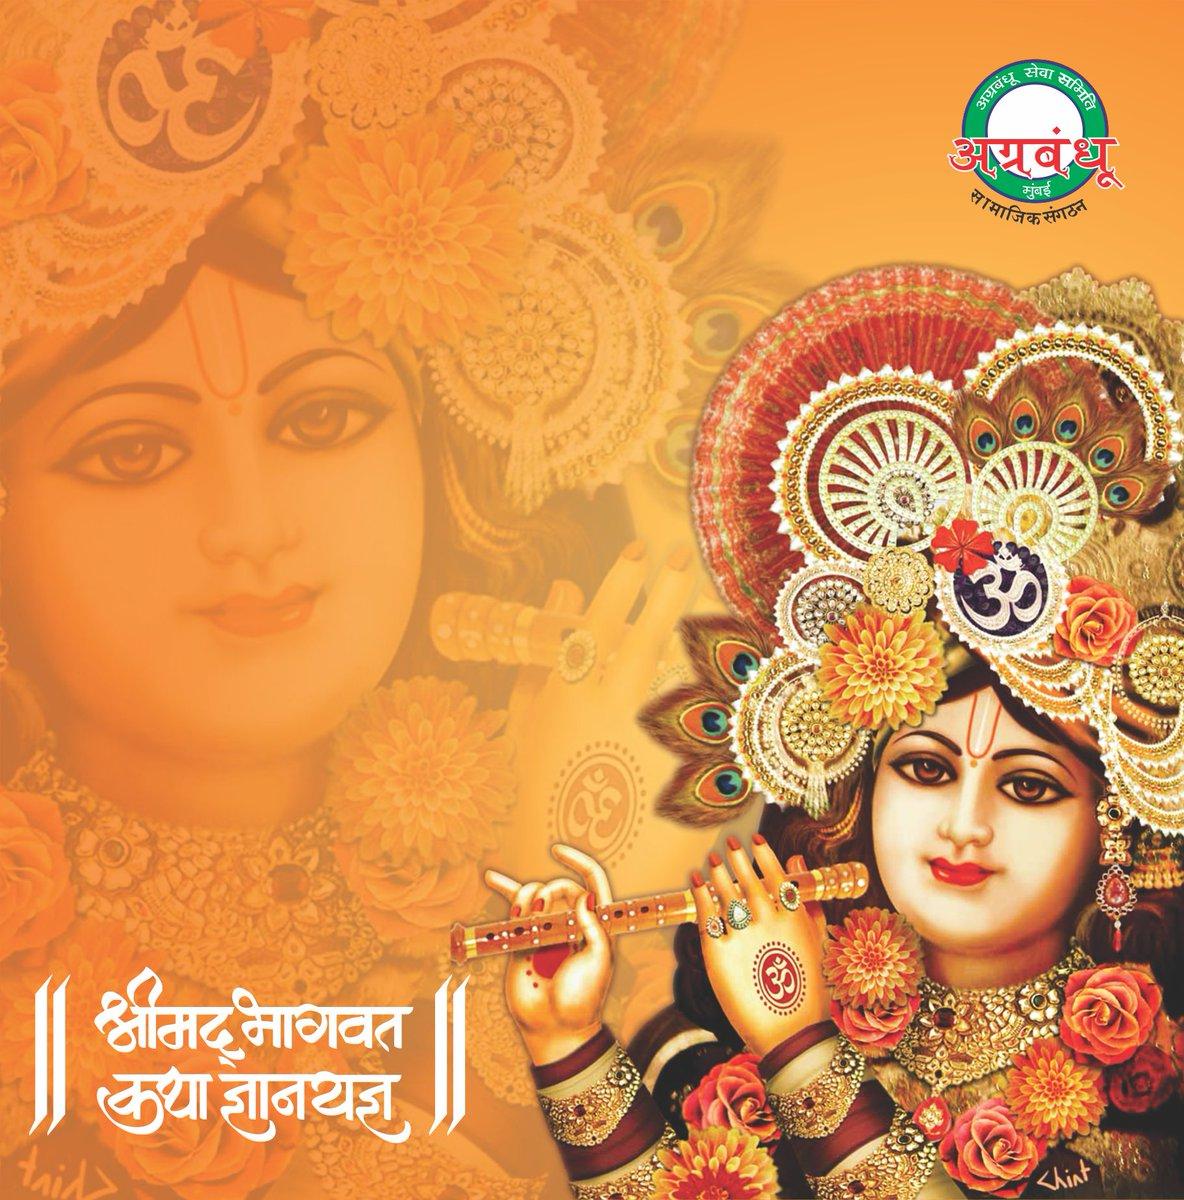 Ajay banka ajaysbanka twitter creatives for shrimad bhagwat katha by kirit bhaijee in mumbai bhagwatkatha invitation mumbai designerpicitterksxn324zhu stopboris Gallery